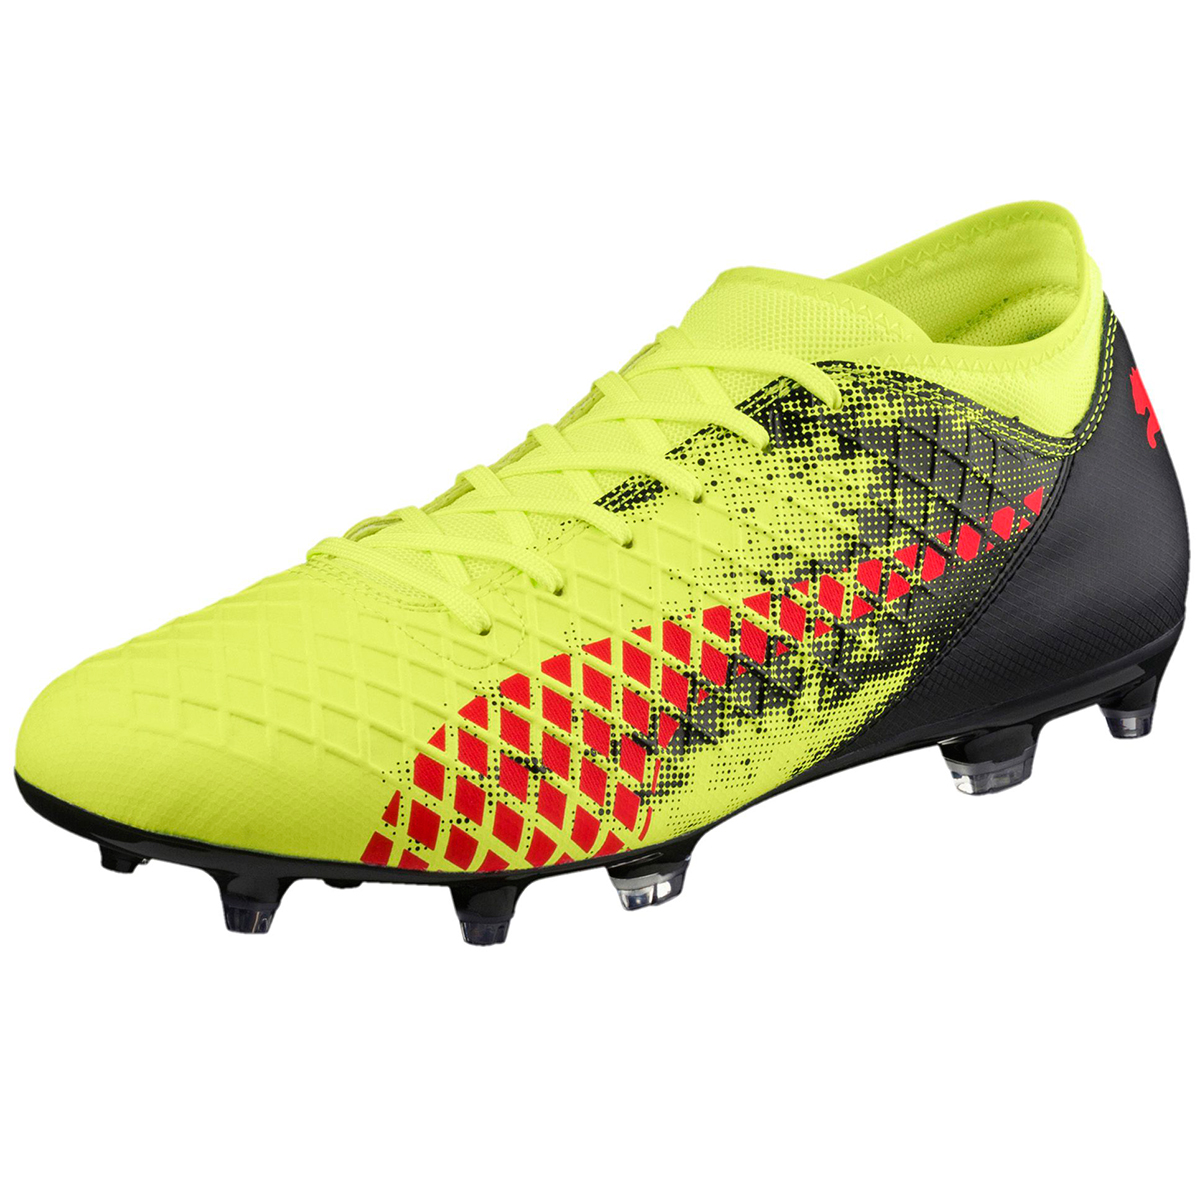 Puma Men's Future 18.4 Fg/ag Soccer Cleats - Yellow, 8